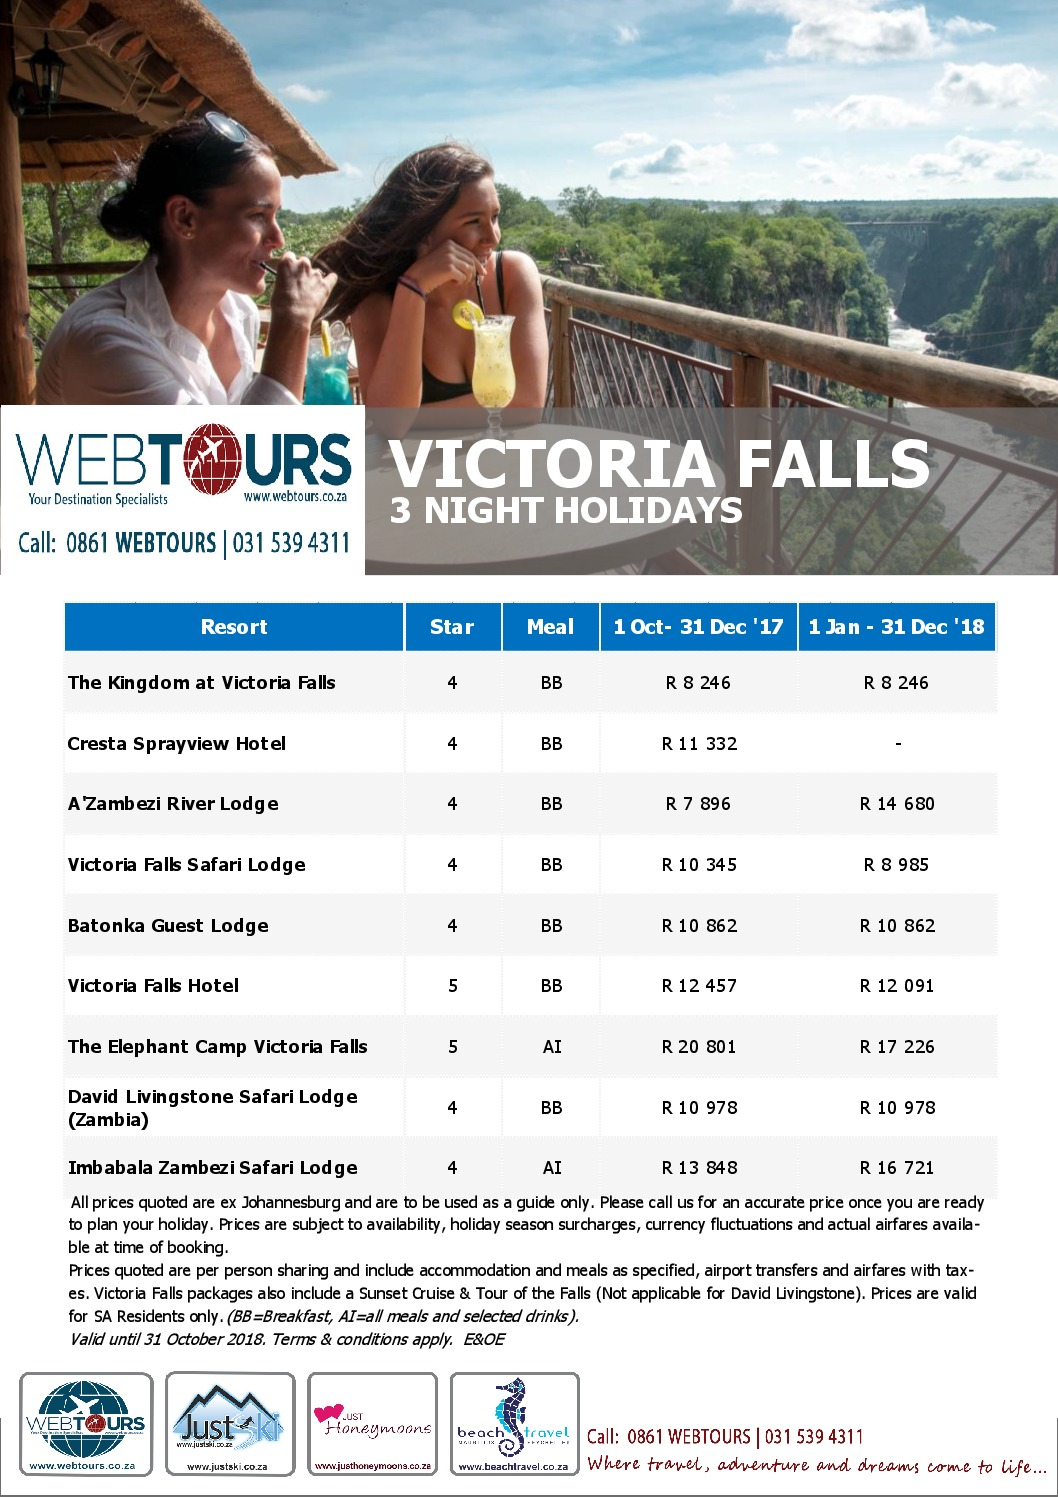 3 Nights Vic Falls, Valid until 31 Dec '18